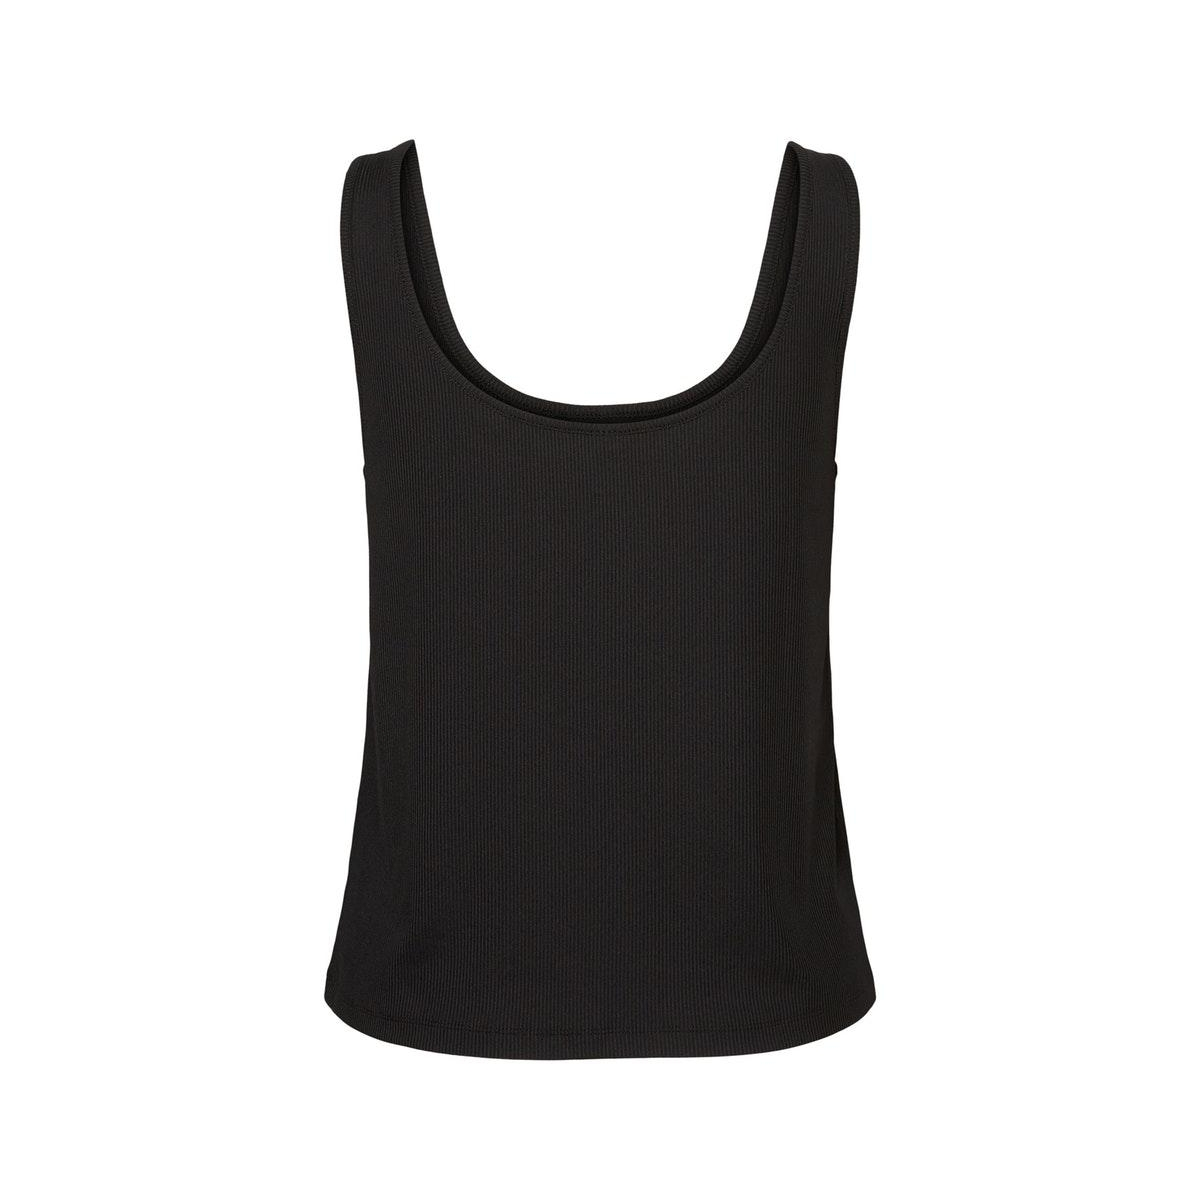 vmpolly  s/l rib button top sb4 ga 10233557 vero moda top black